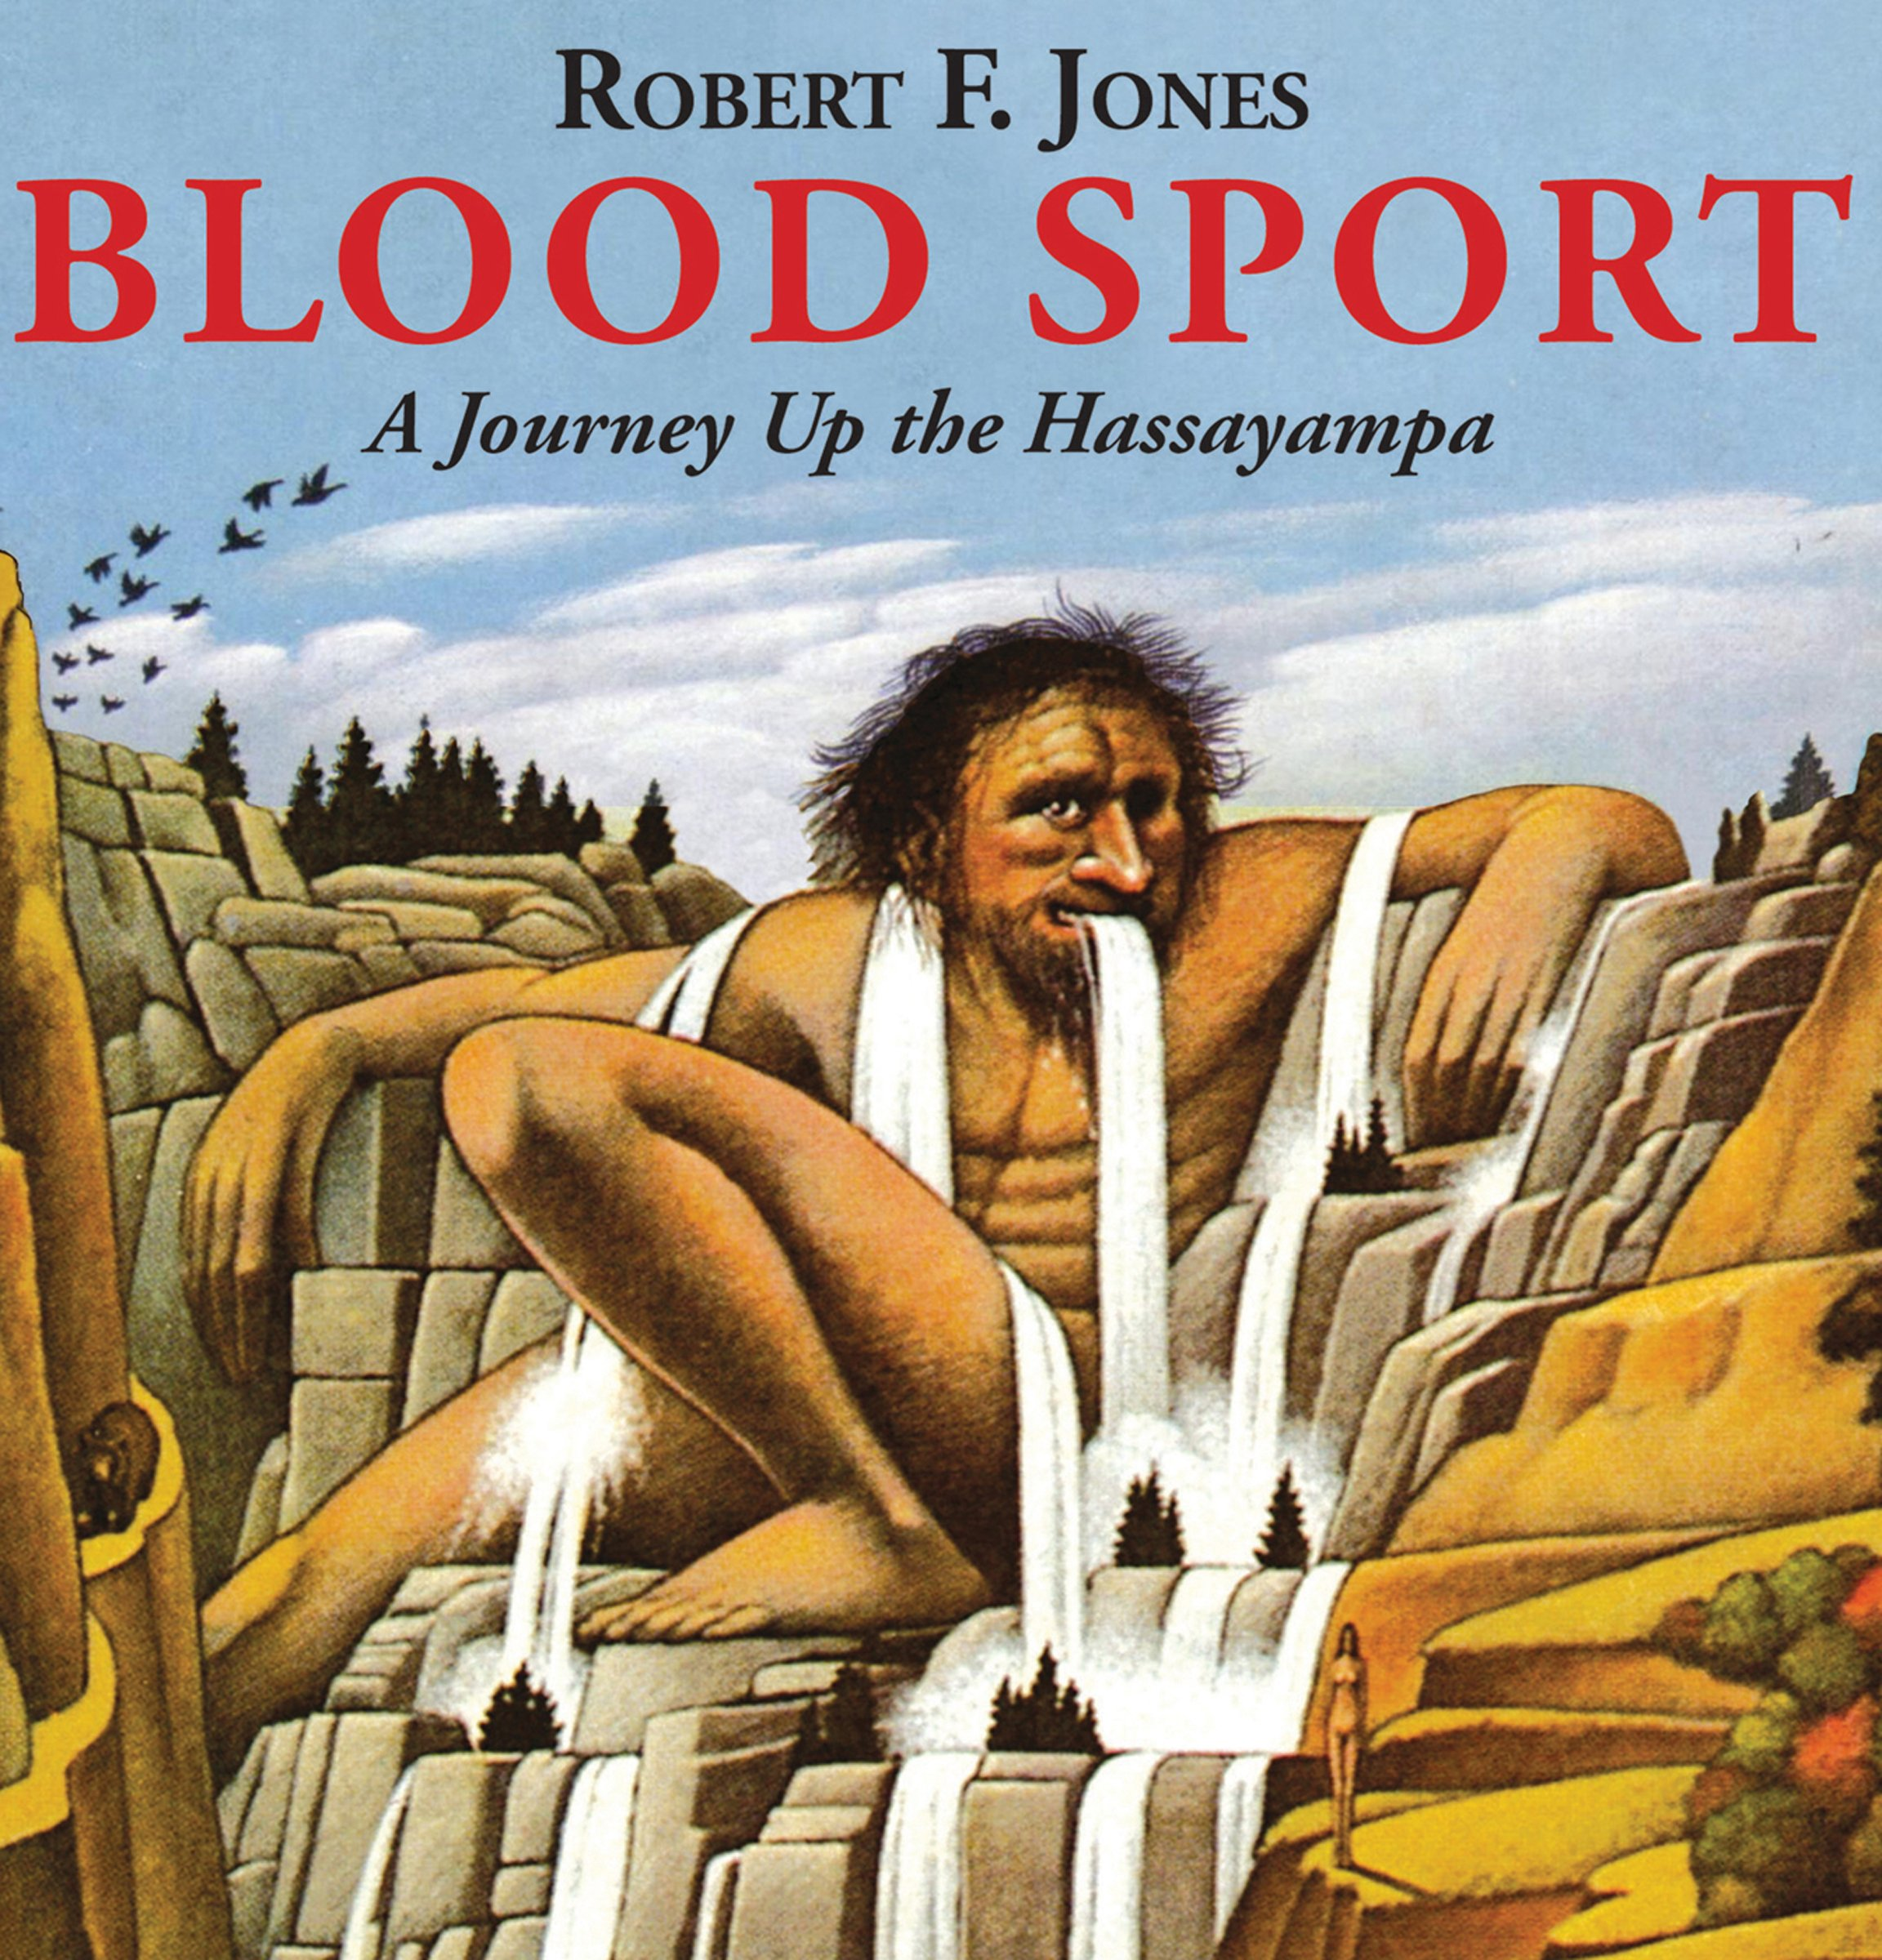 Blood Sport: A Journey Up the Hassayampa